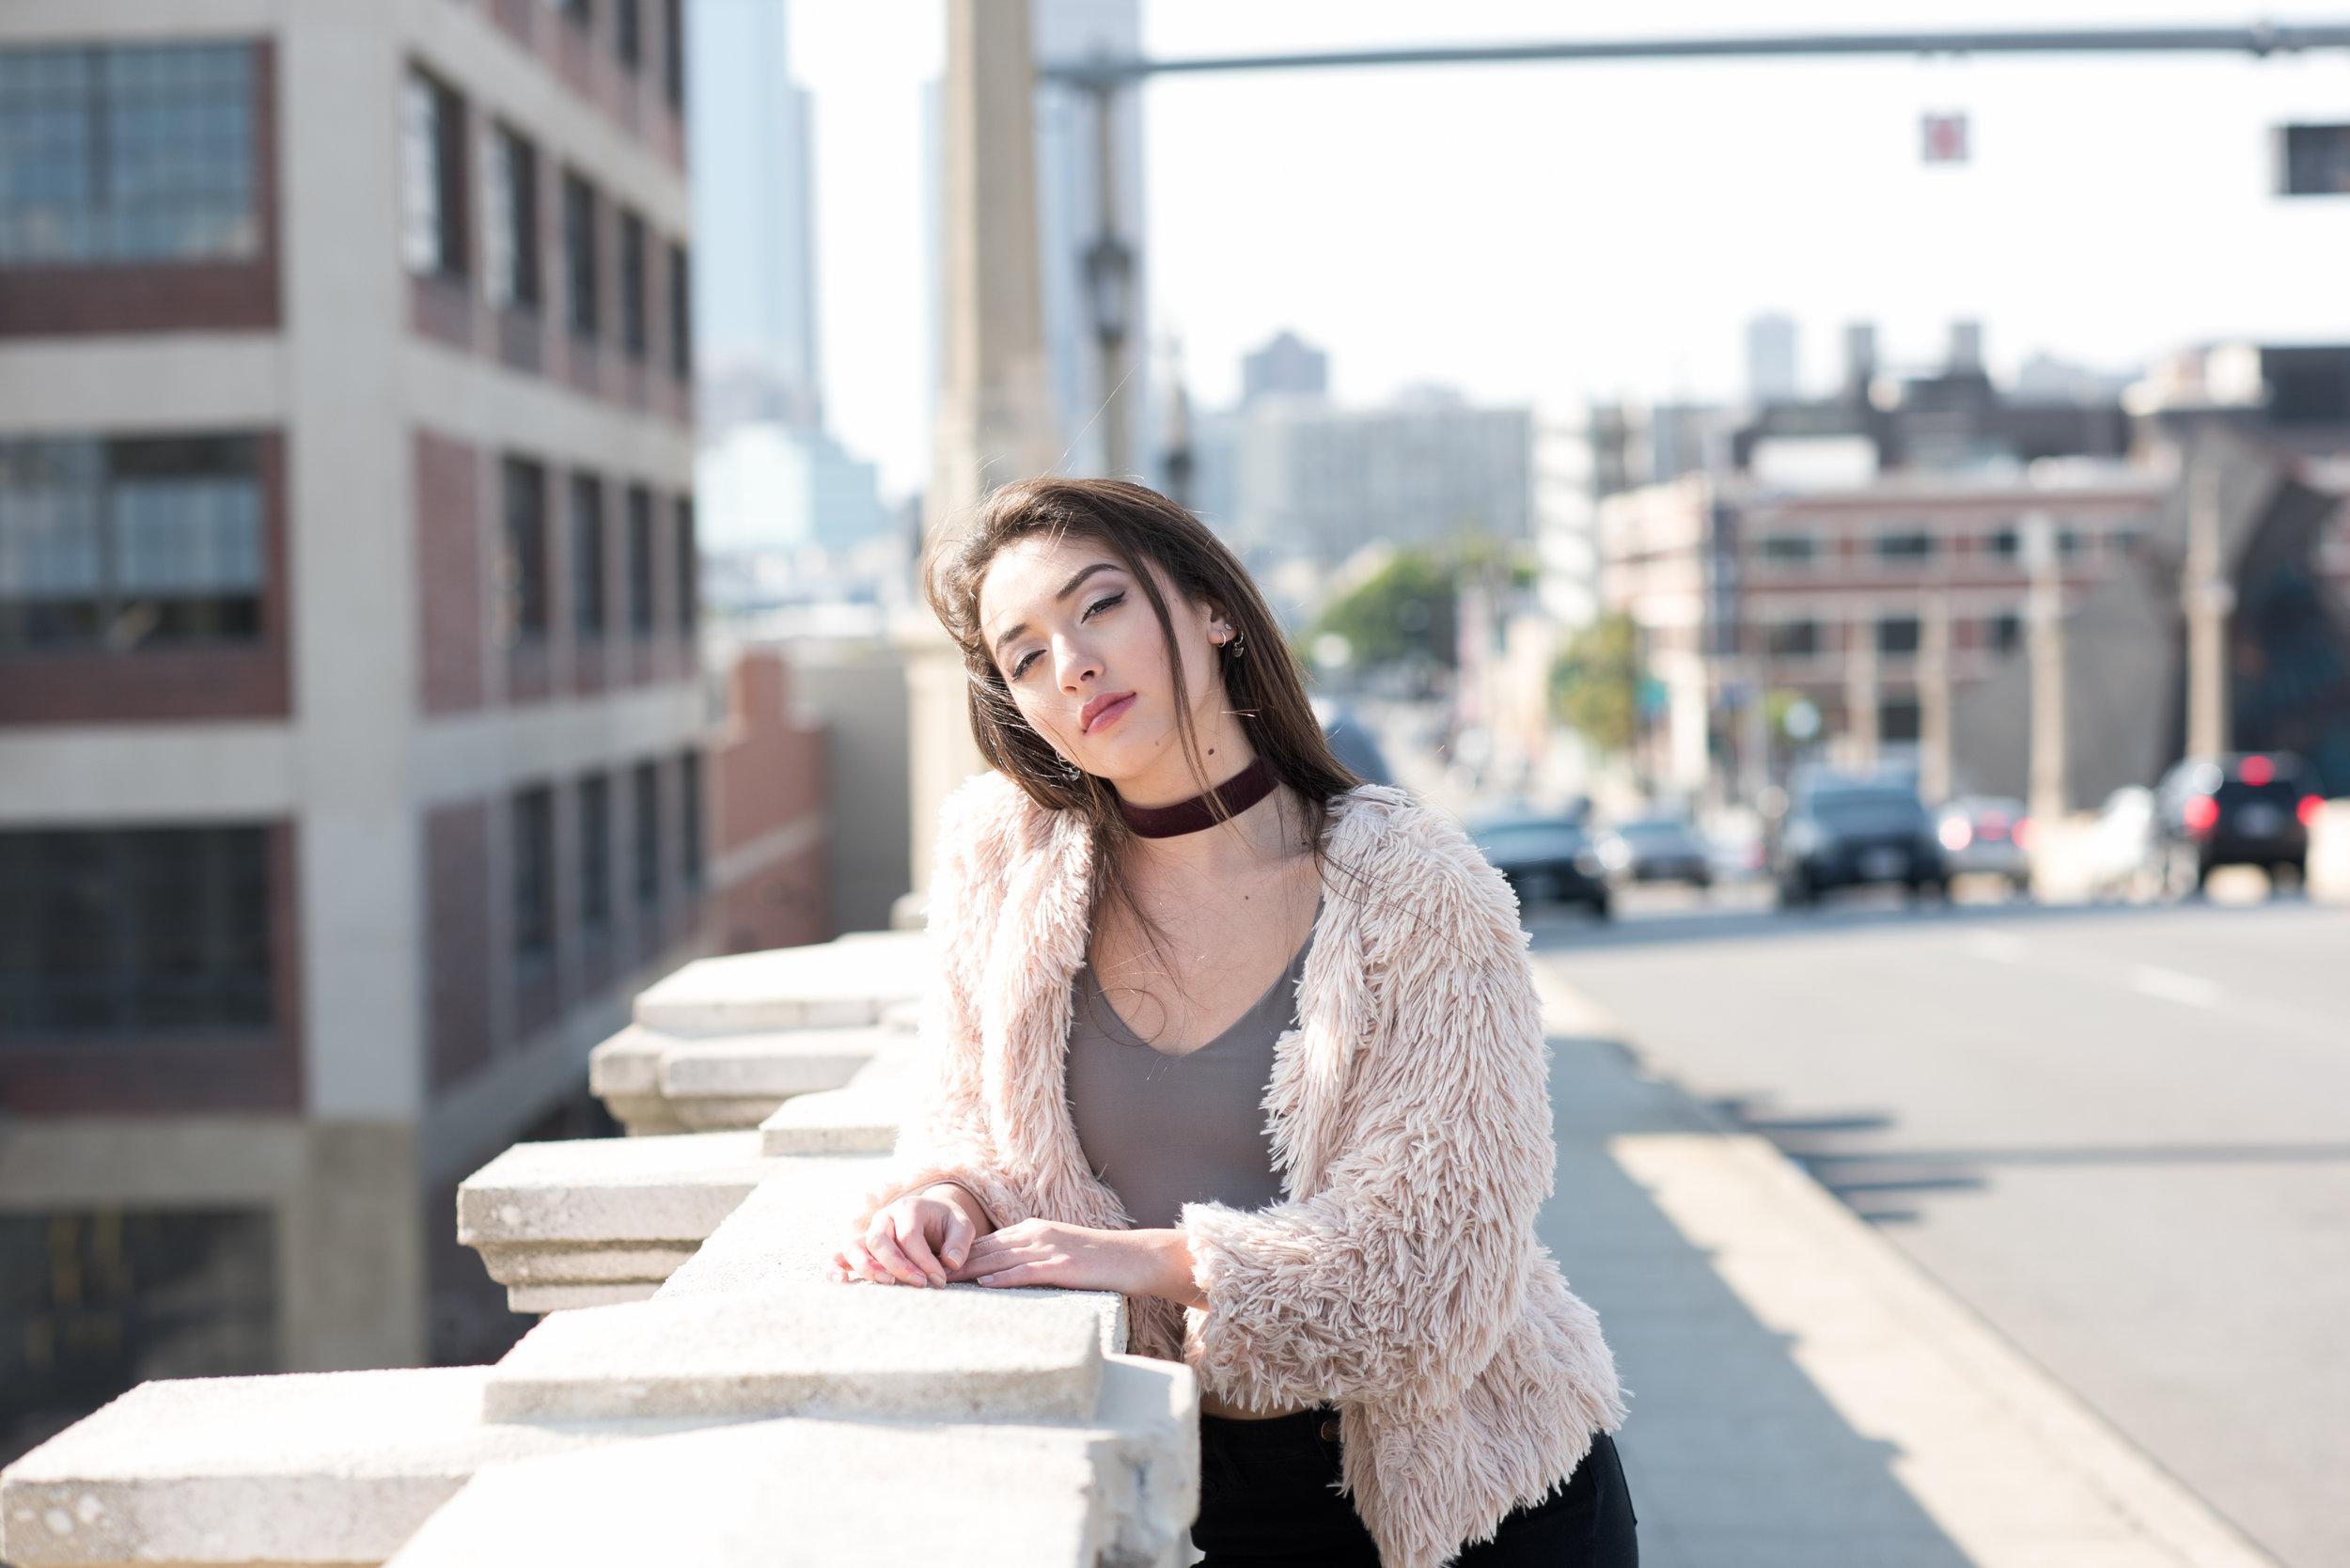 Senior girl wearing a fur coat leaning against bridge railing